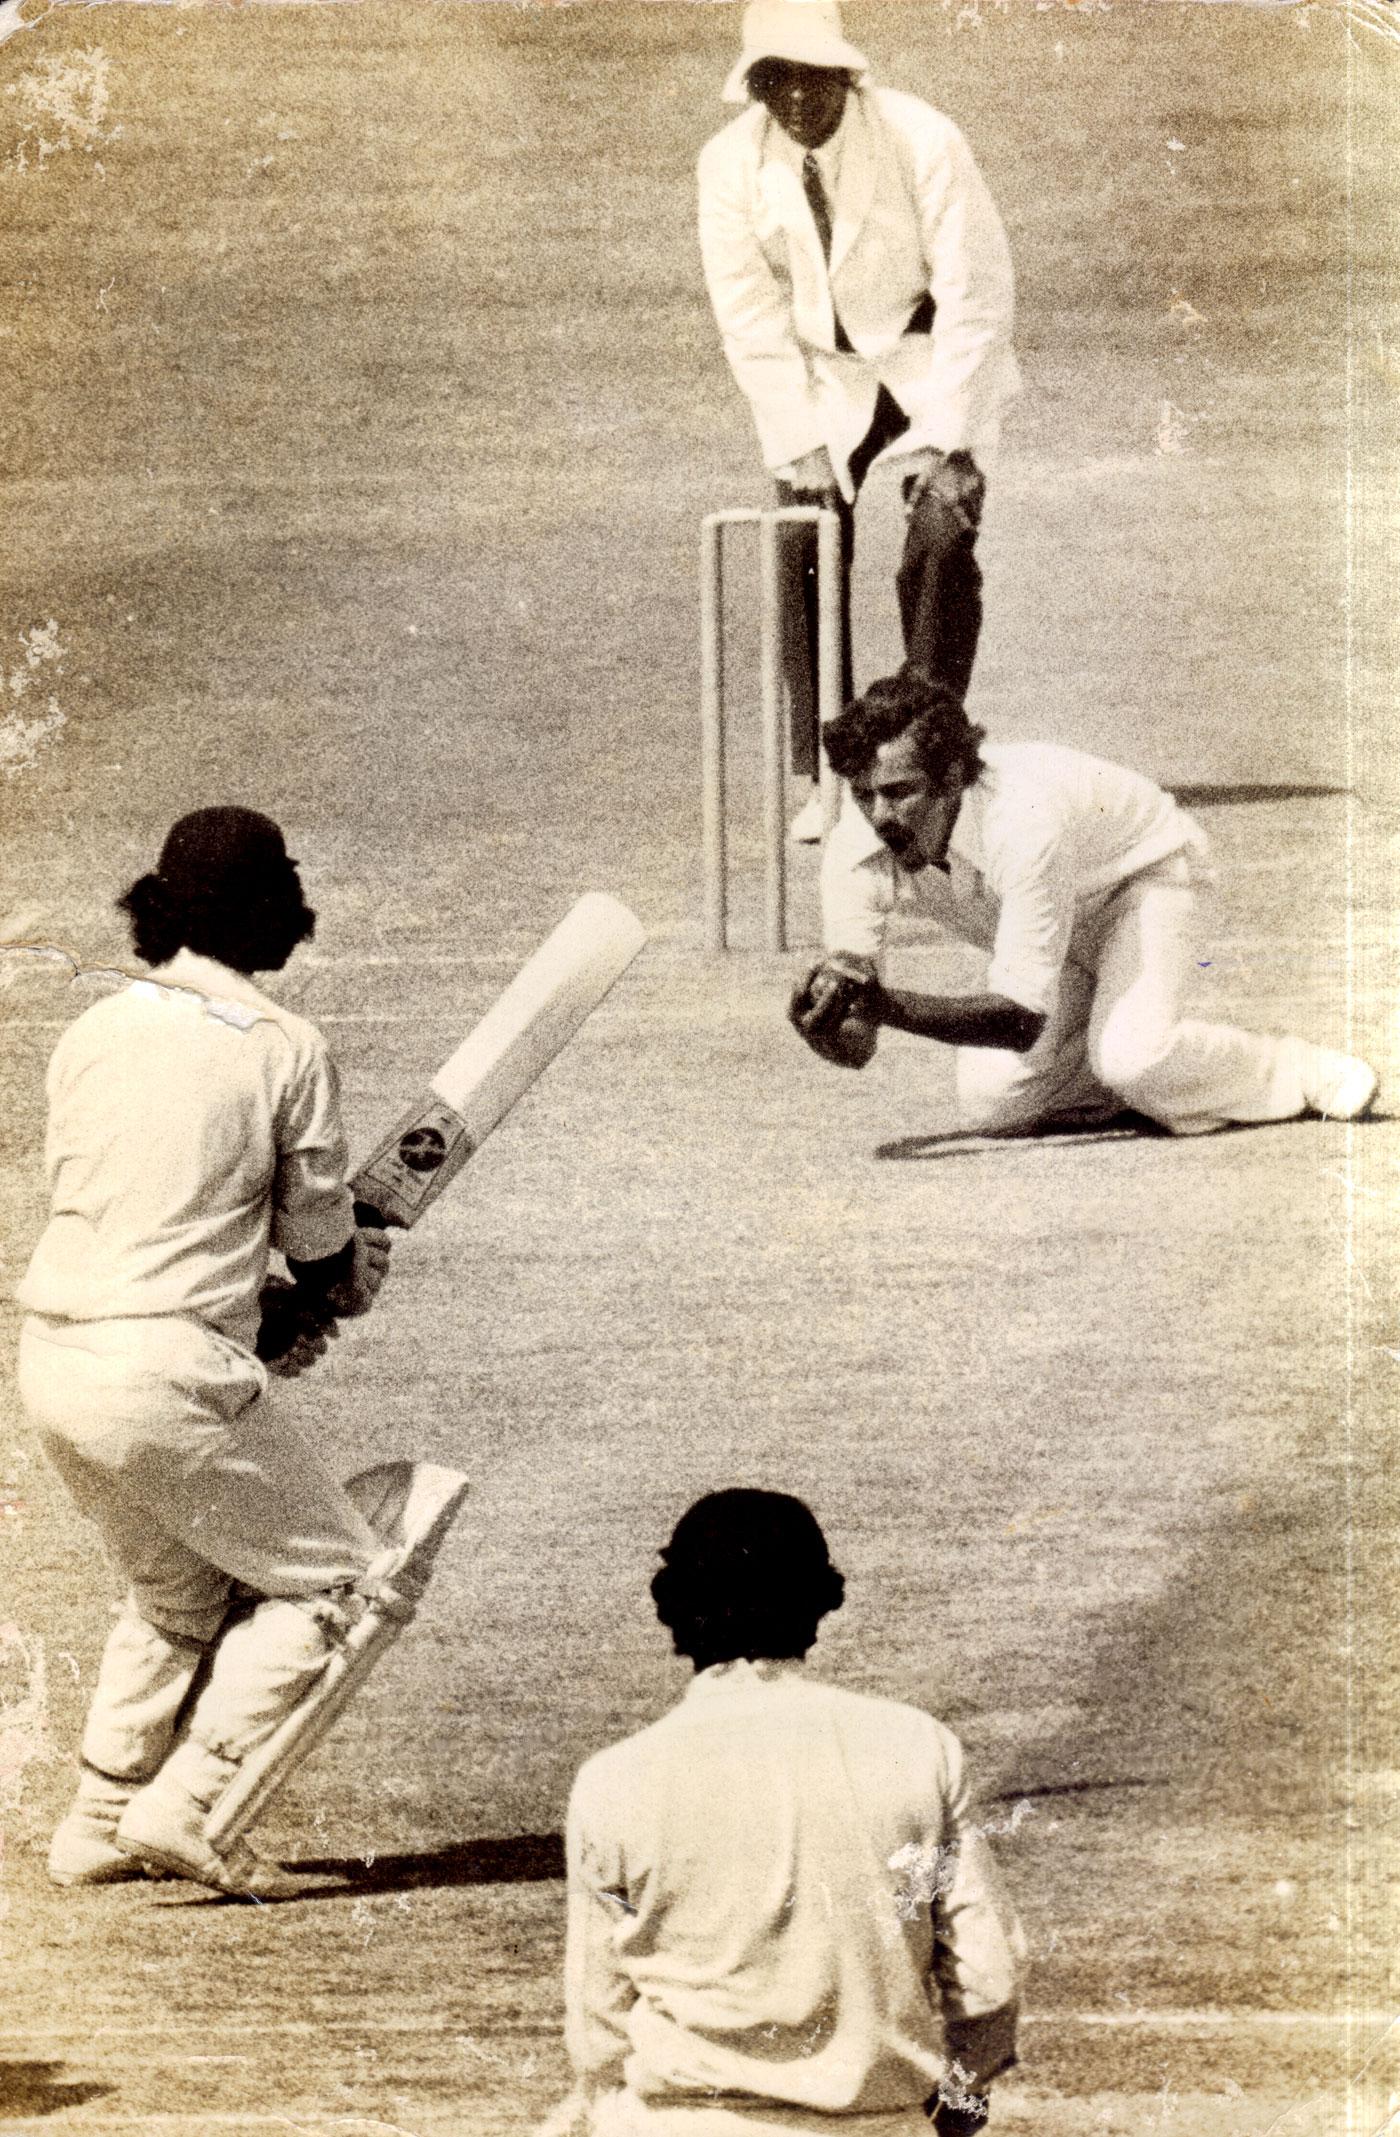 Ramnarayan catches Gundappa Viswanath off his own bowling in a Ranji game in 1976